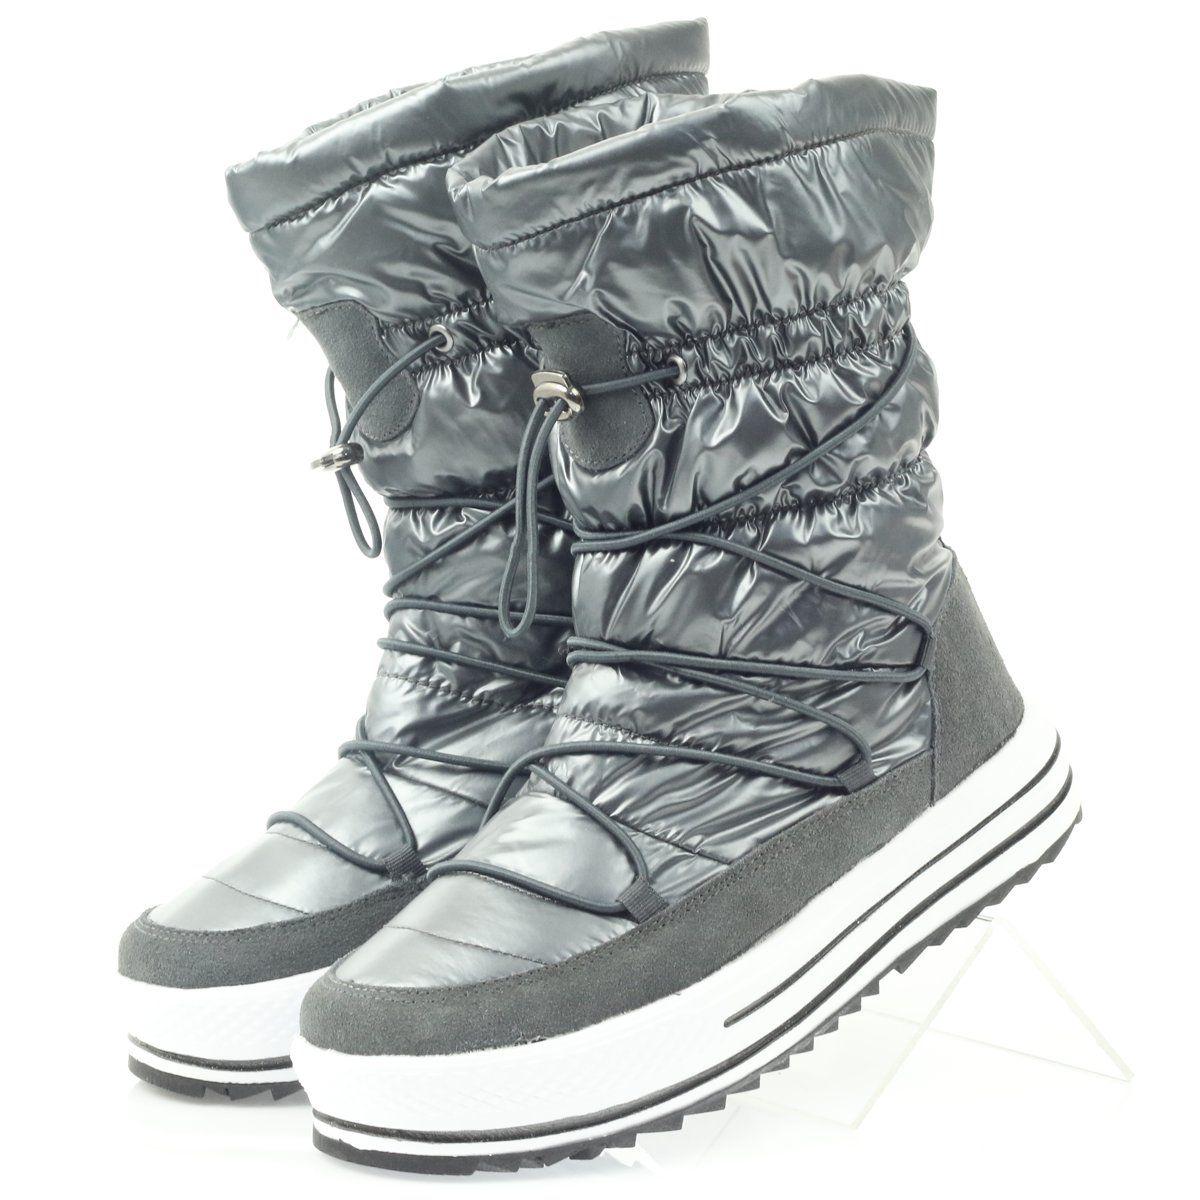 Sniegowce Sportowe Na Futerku Dk Szare Boots Army Boot Combat Boots